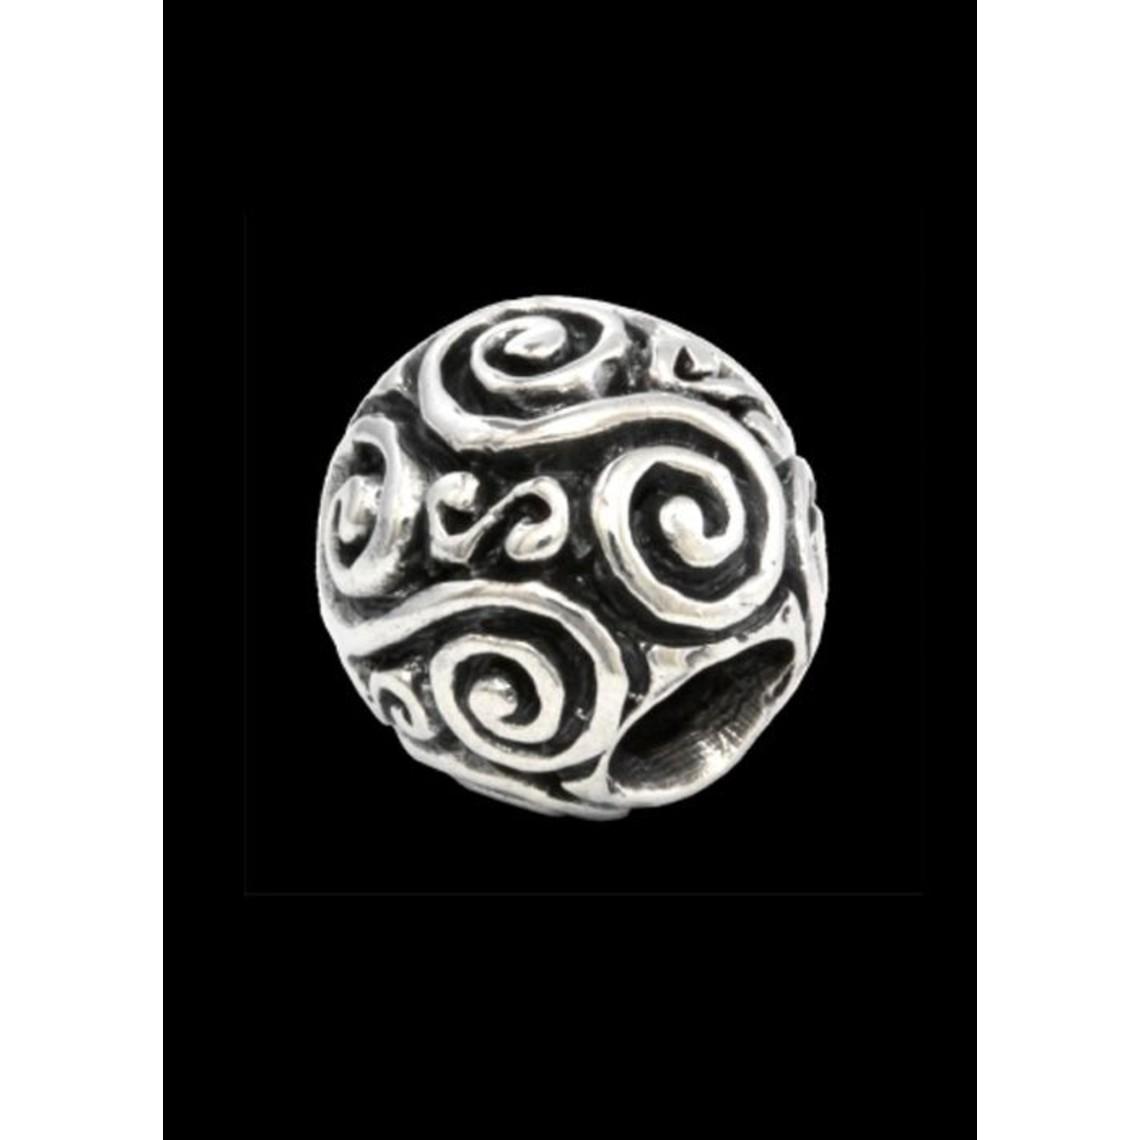 Beardbead con doppia spirale d'argento